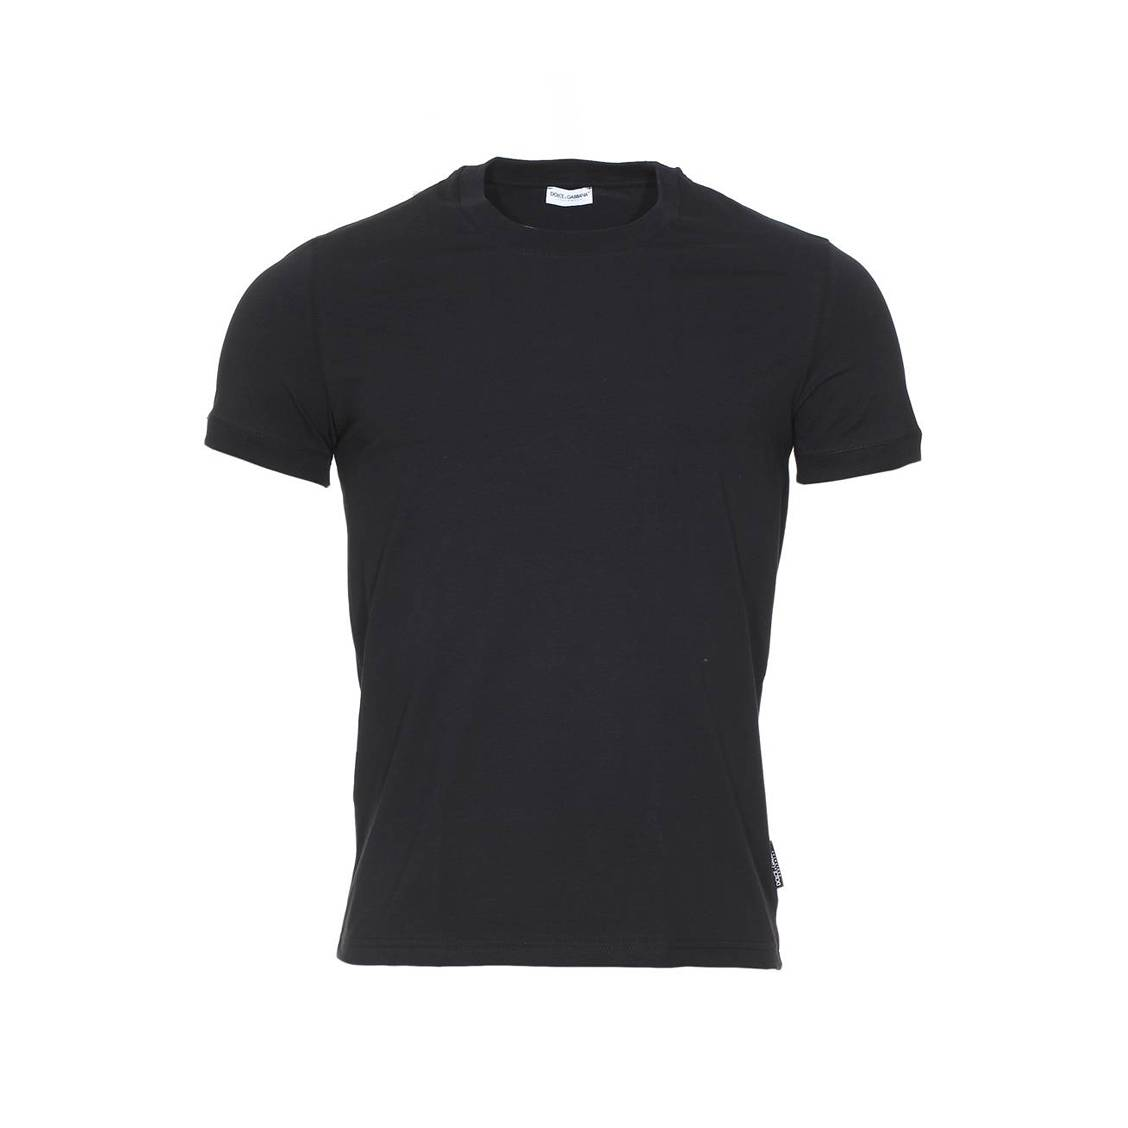 Tee-shirt col rond  en coton stretch noir